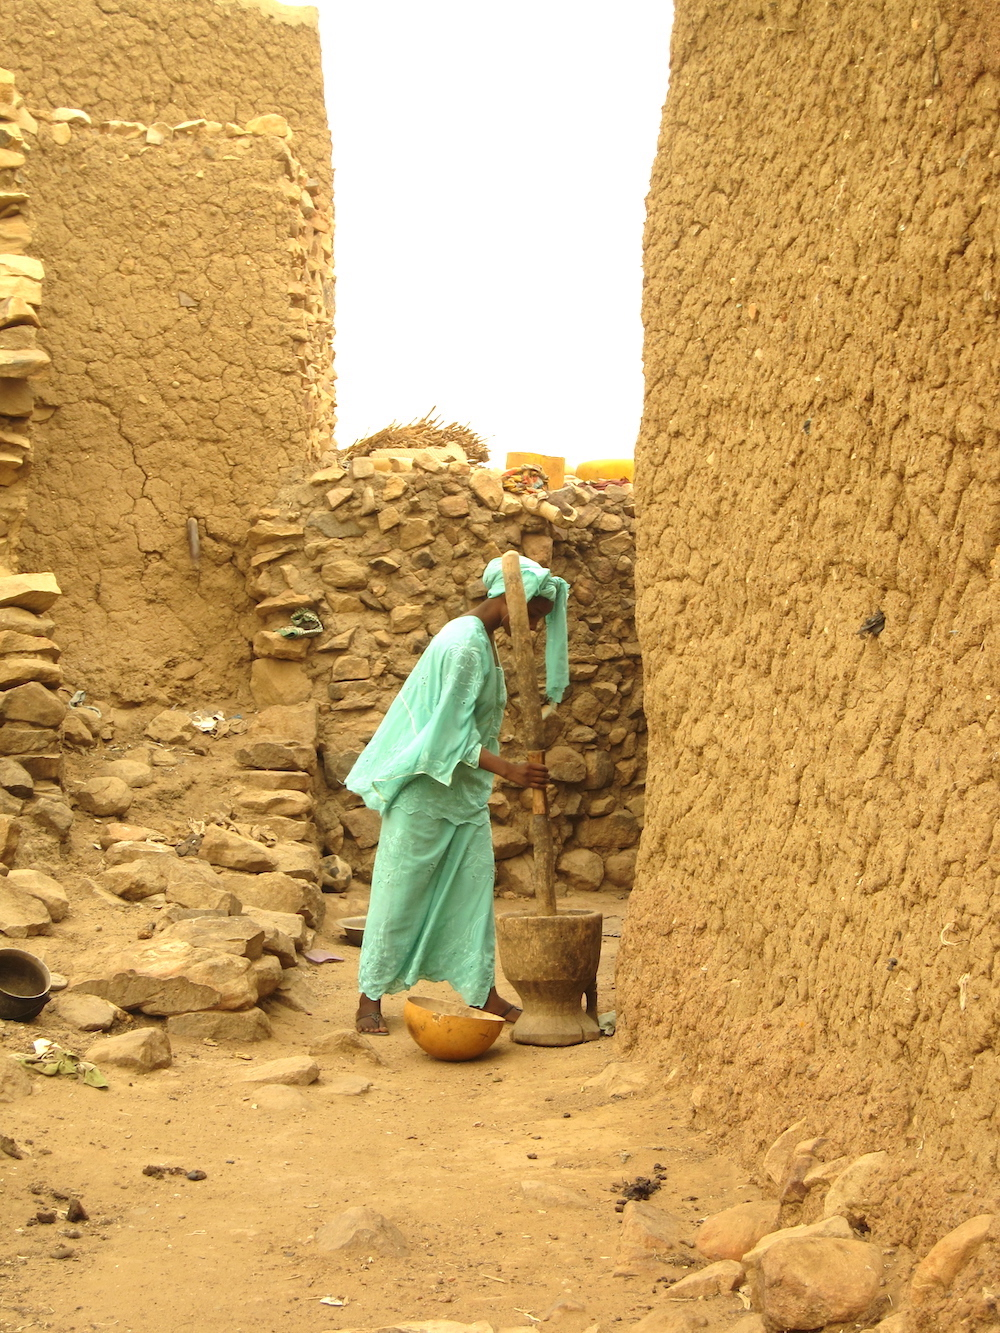 A woman prepares artisanal beer in a street of Hombori, Mali. Photo: Patti Neves